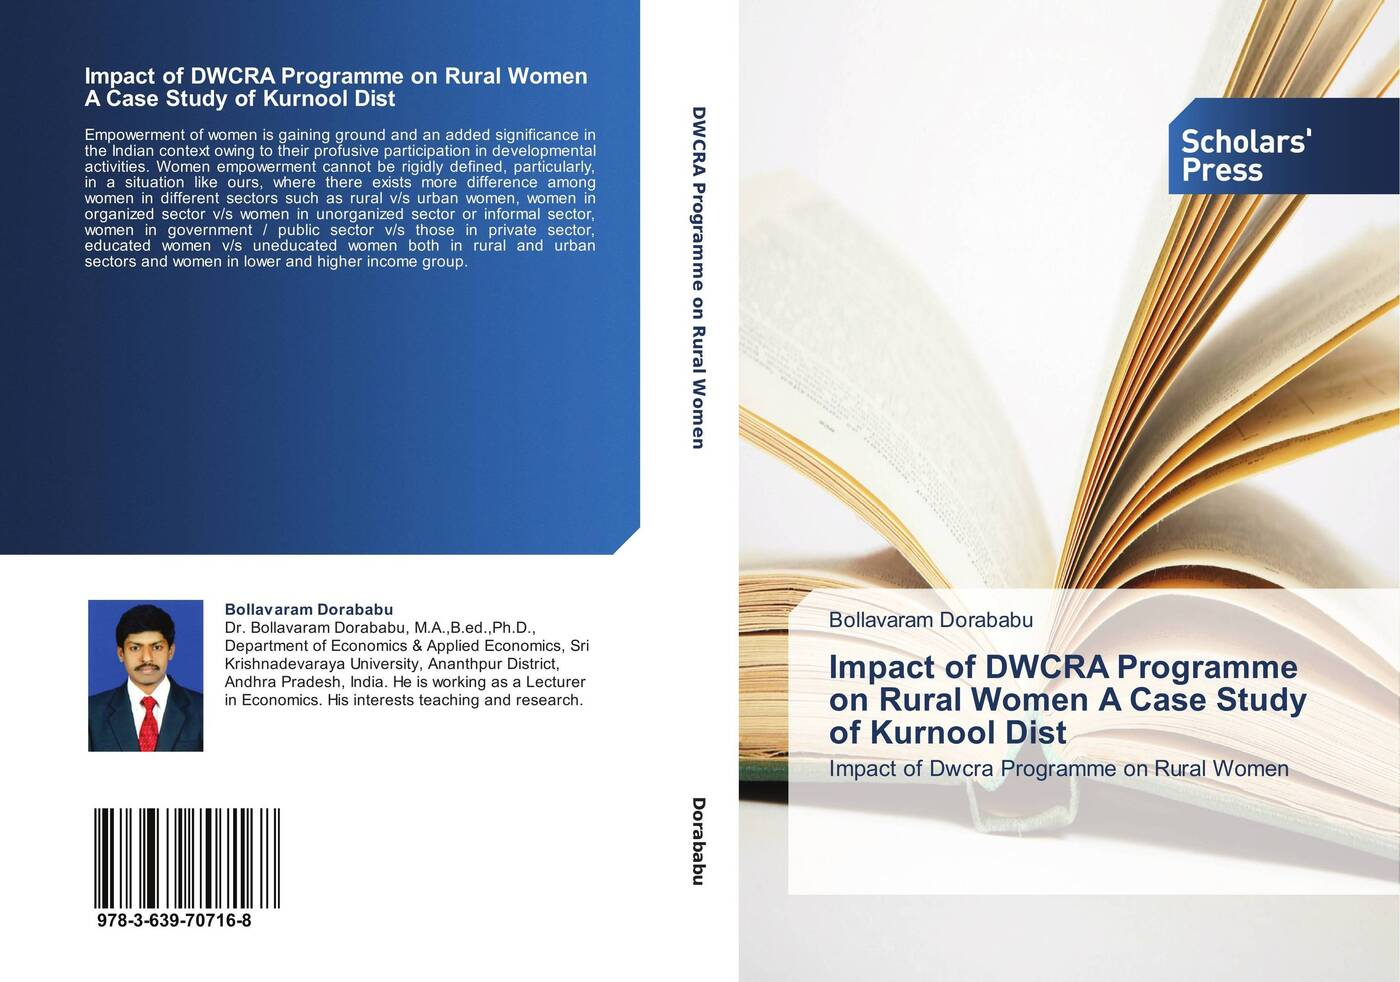 Bollavaram Dorababu Impact of DWCRA Programme on Rural Women A Case Study of Kurnool Dist women